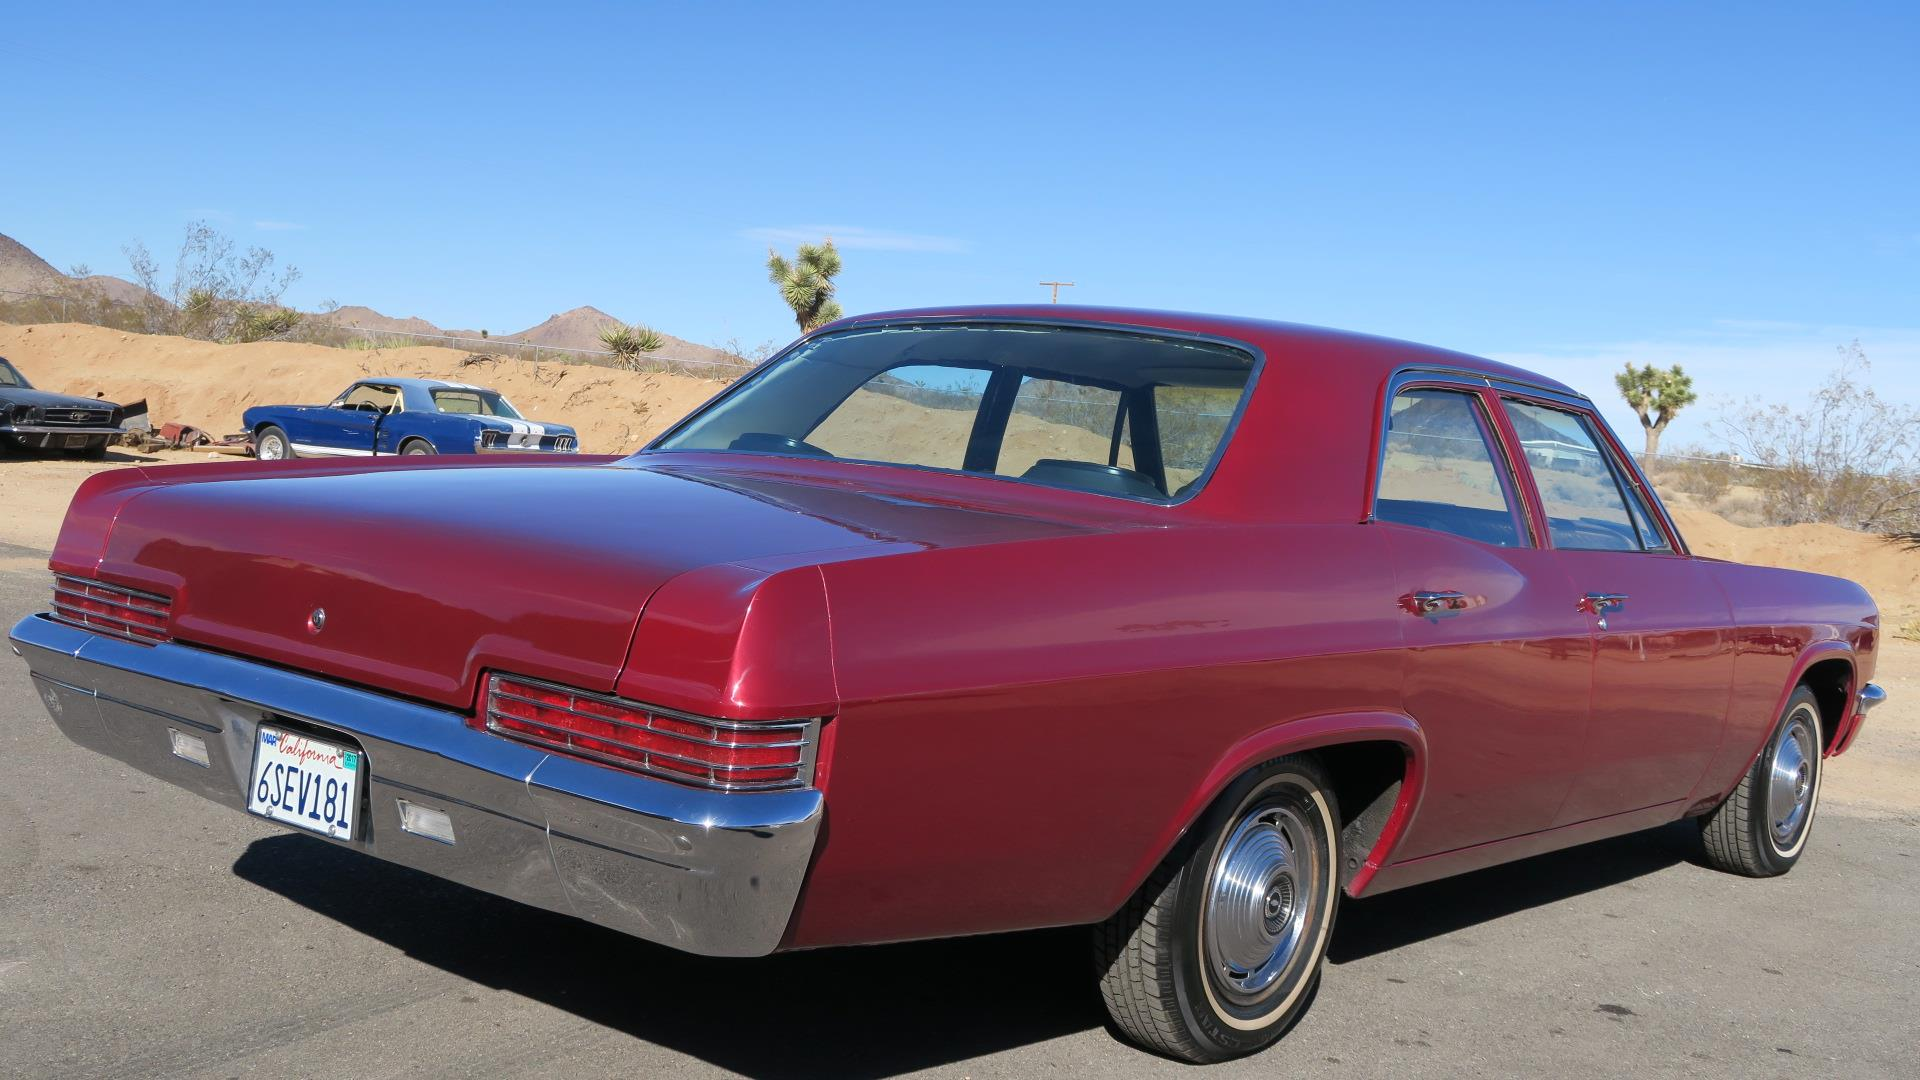 1966 Chevrolet Impala Sedan Ca Car 350 V8 Only 3200 Miles On Full Chevy Frame Prevnext